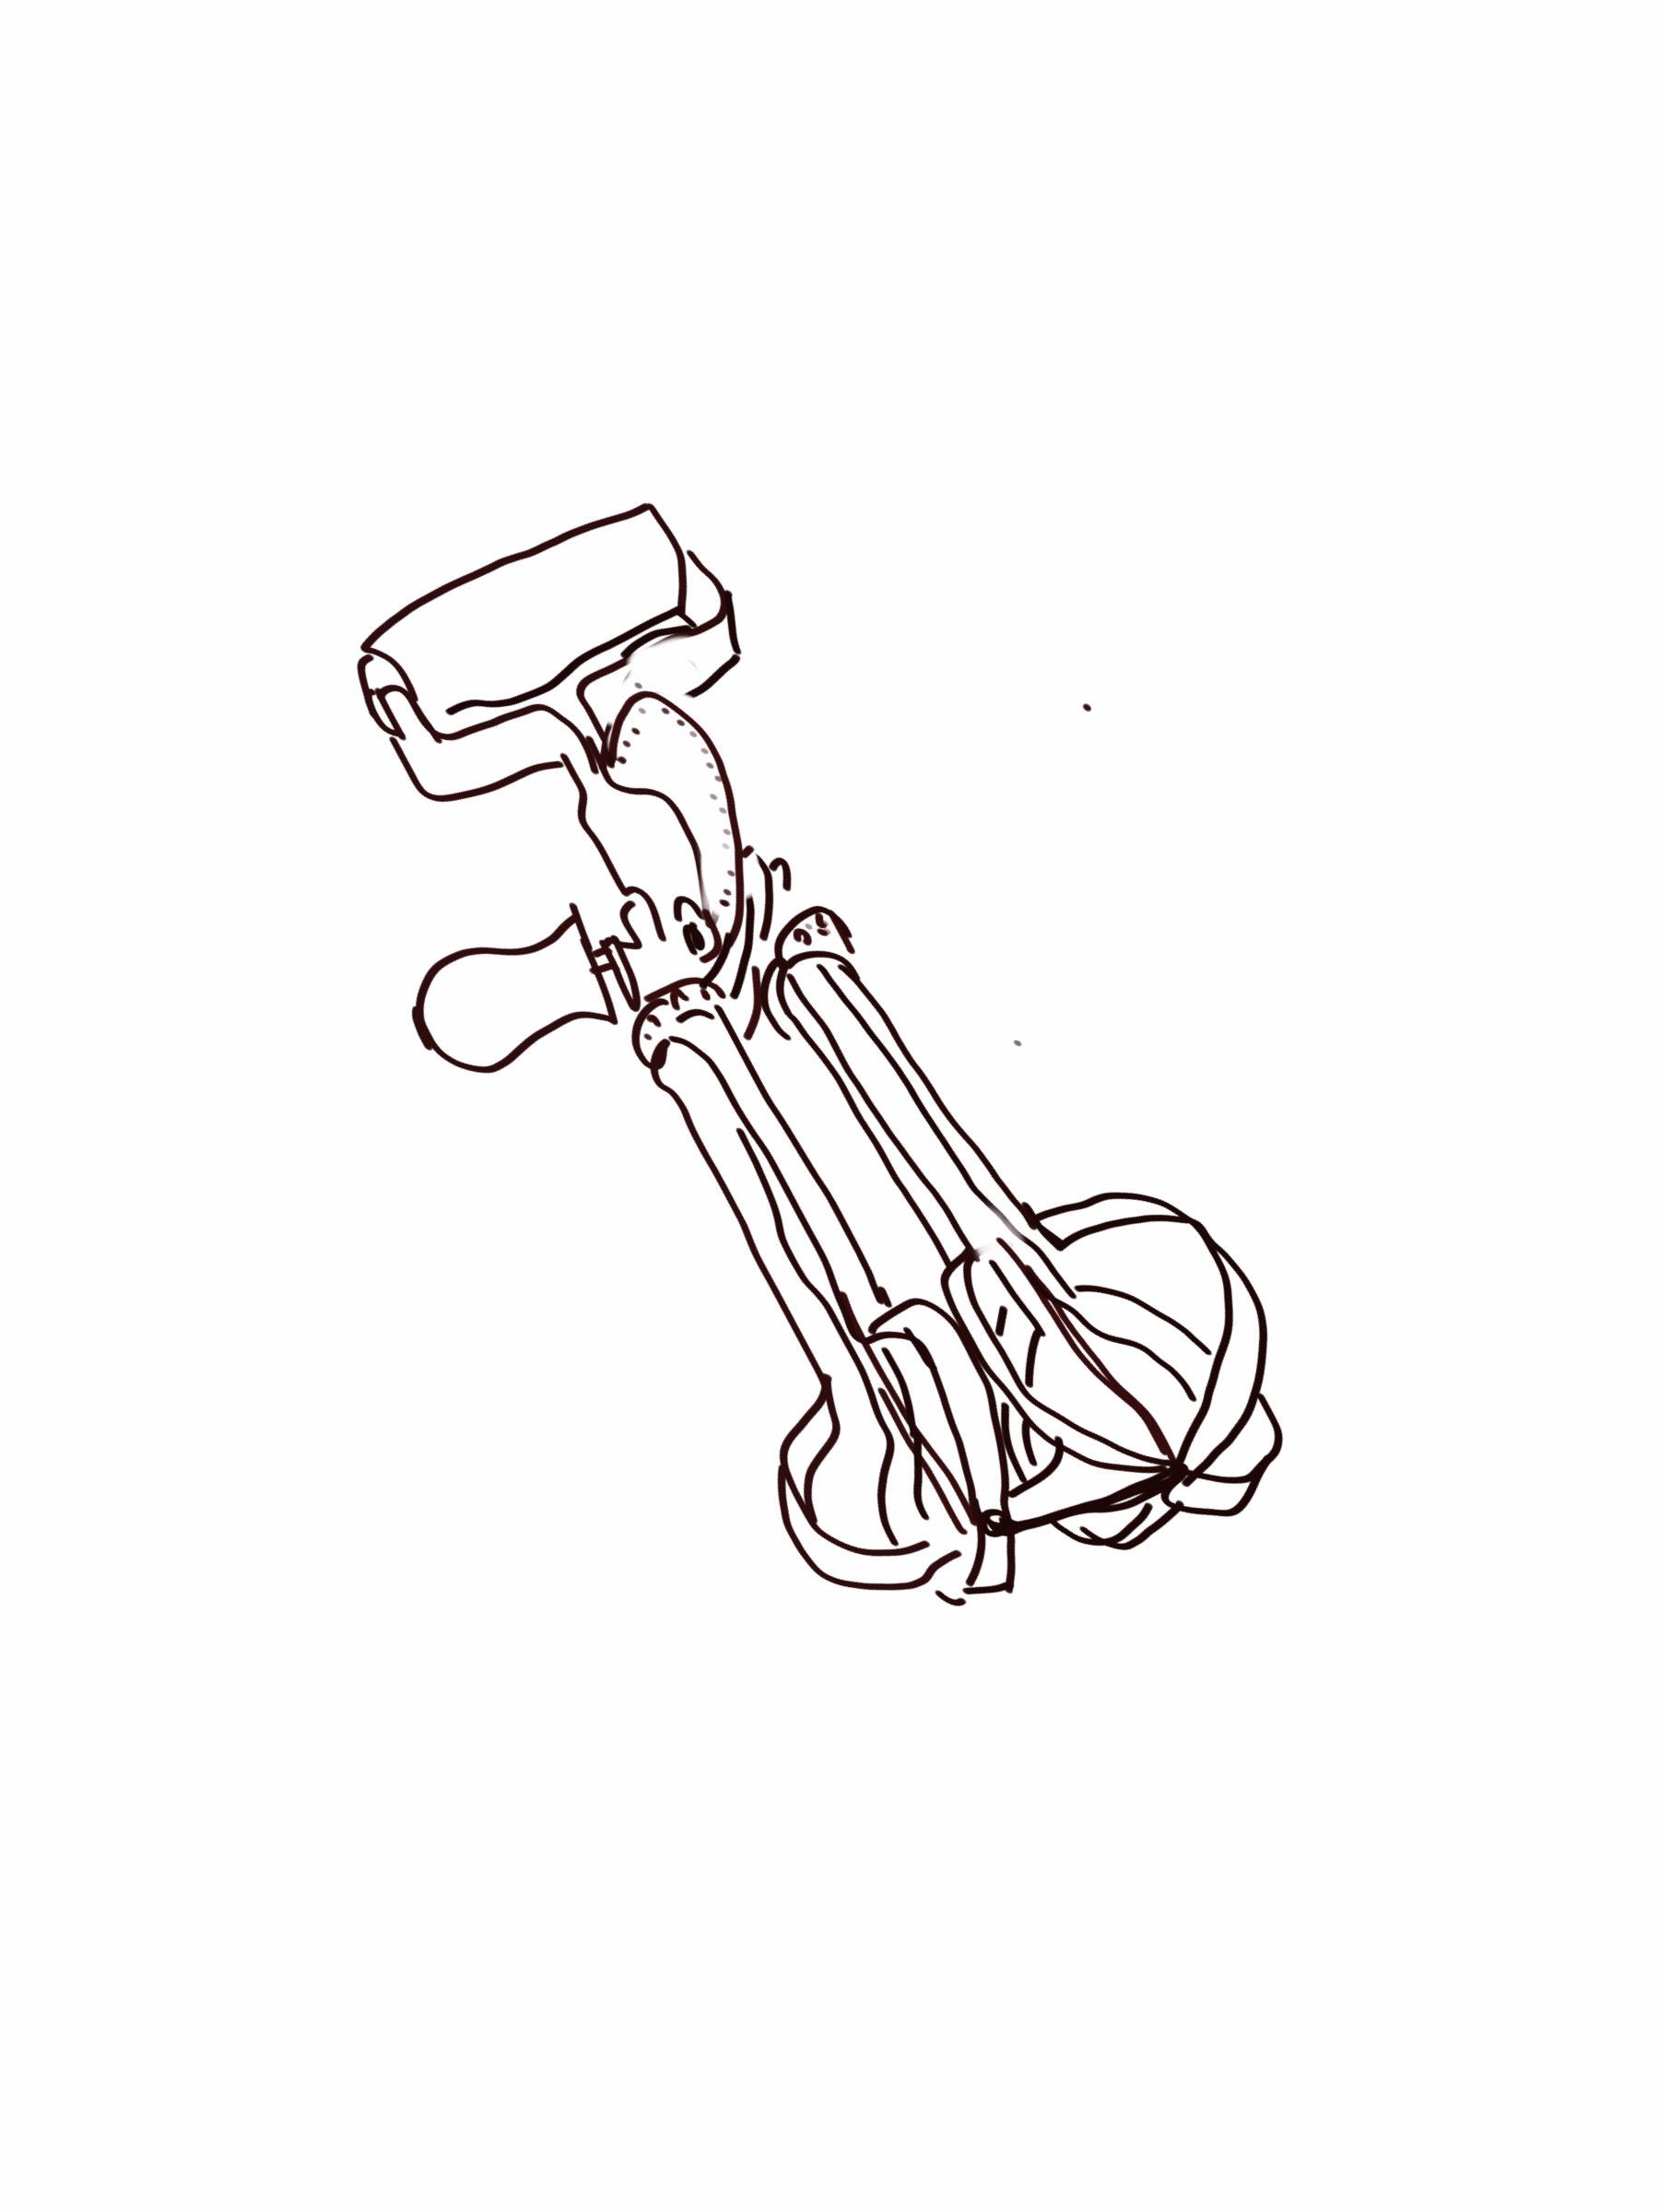 1800x2400 Ipad Sketch Eggbeater01 Illustration Ipad